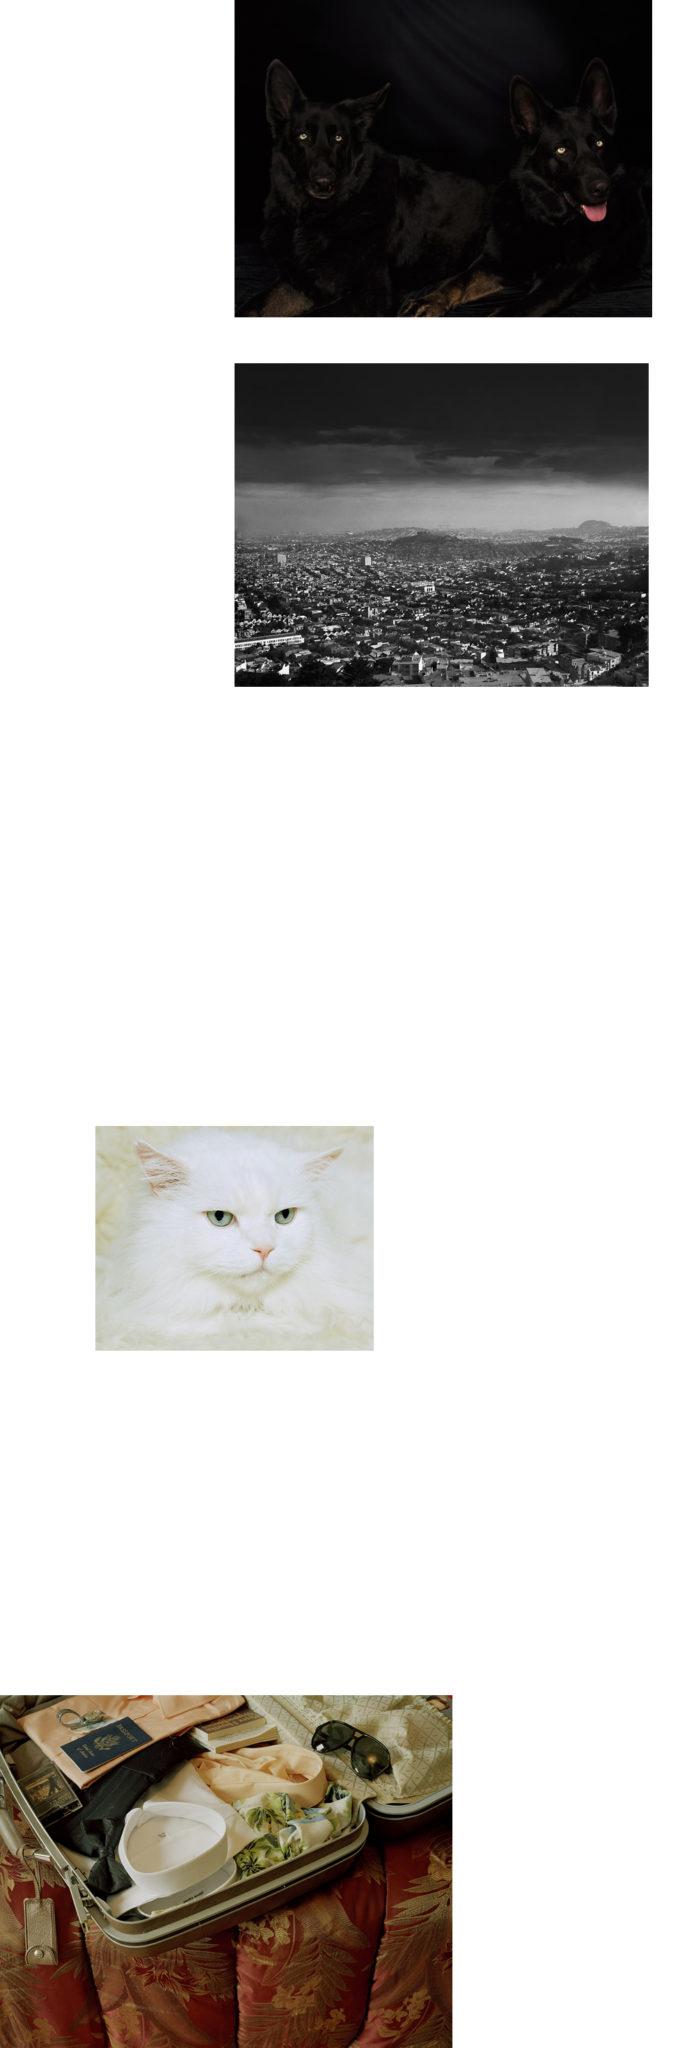 michele-abeles-11